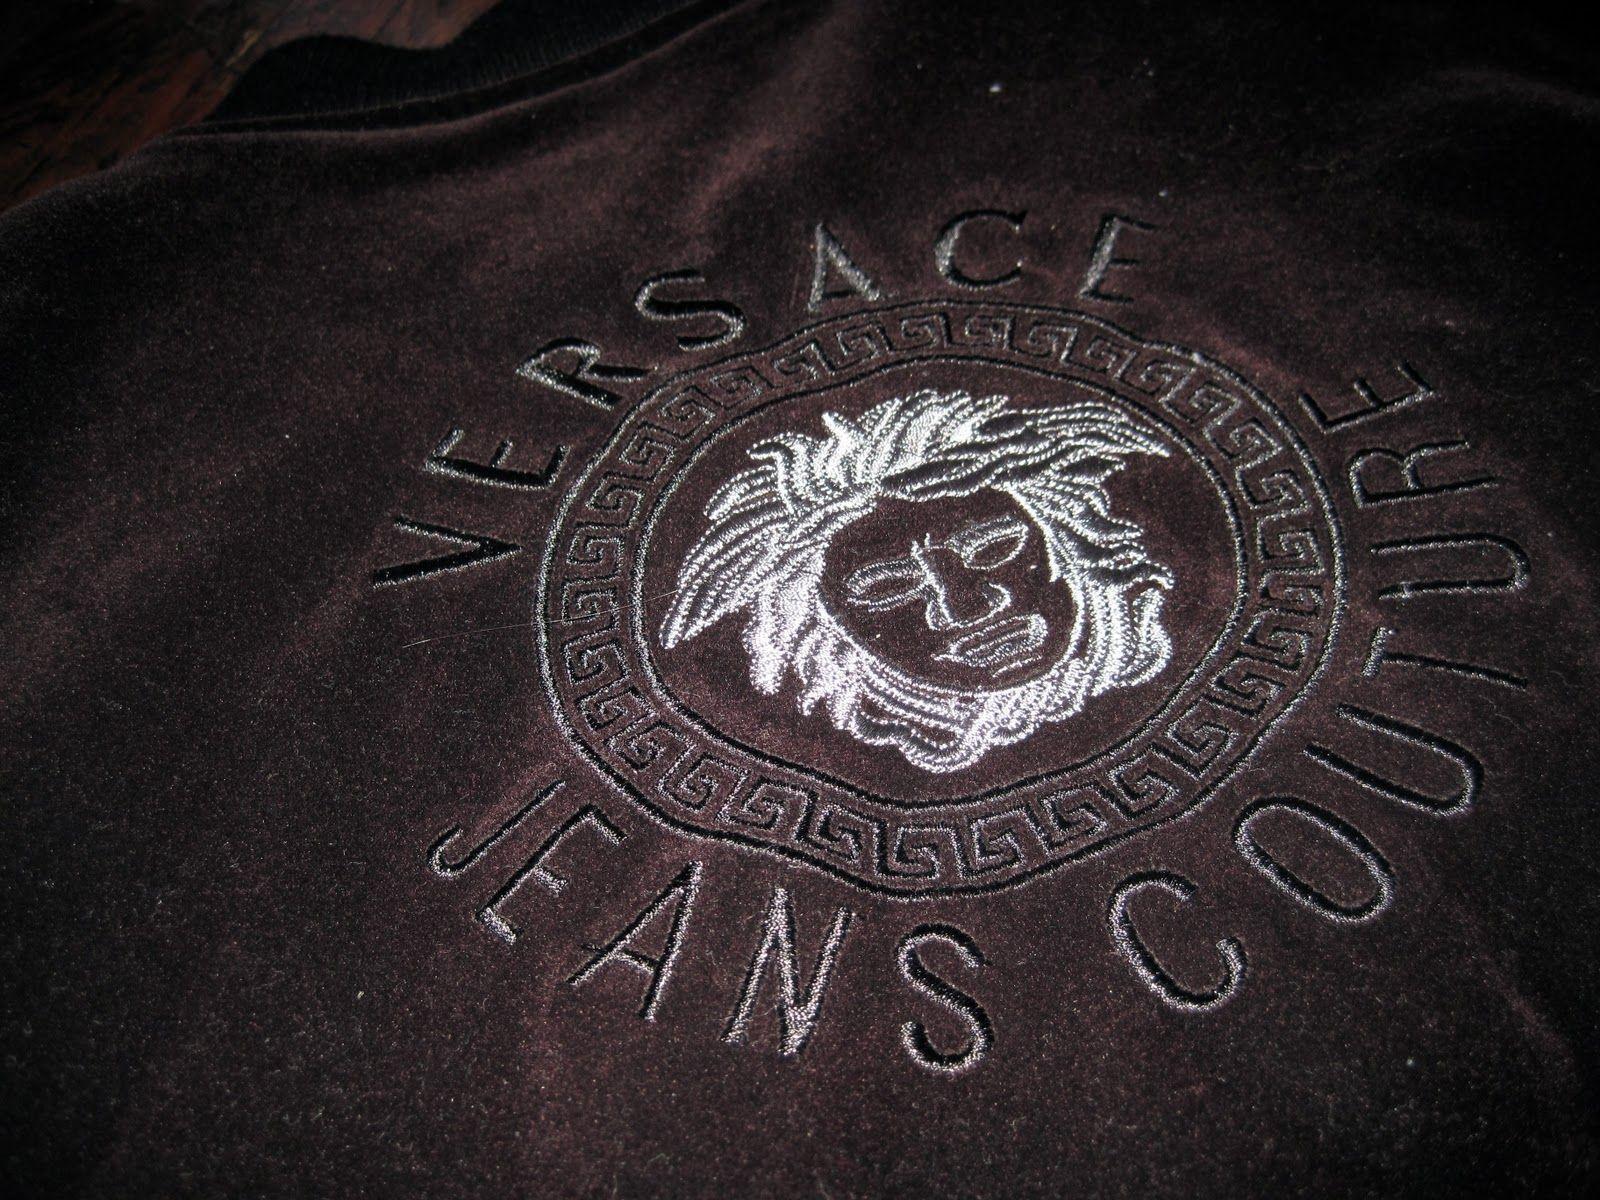 Versace Medusa Wallpaper PC Most